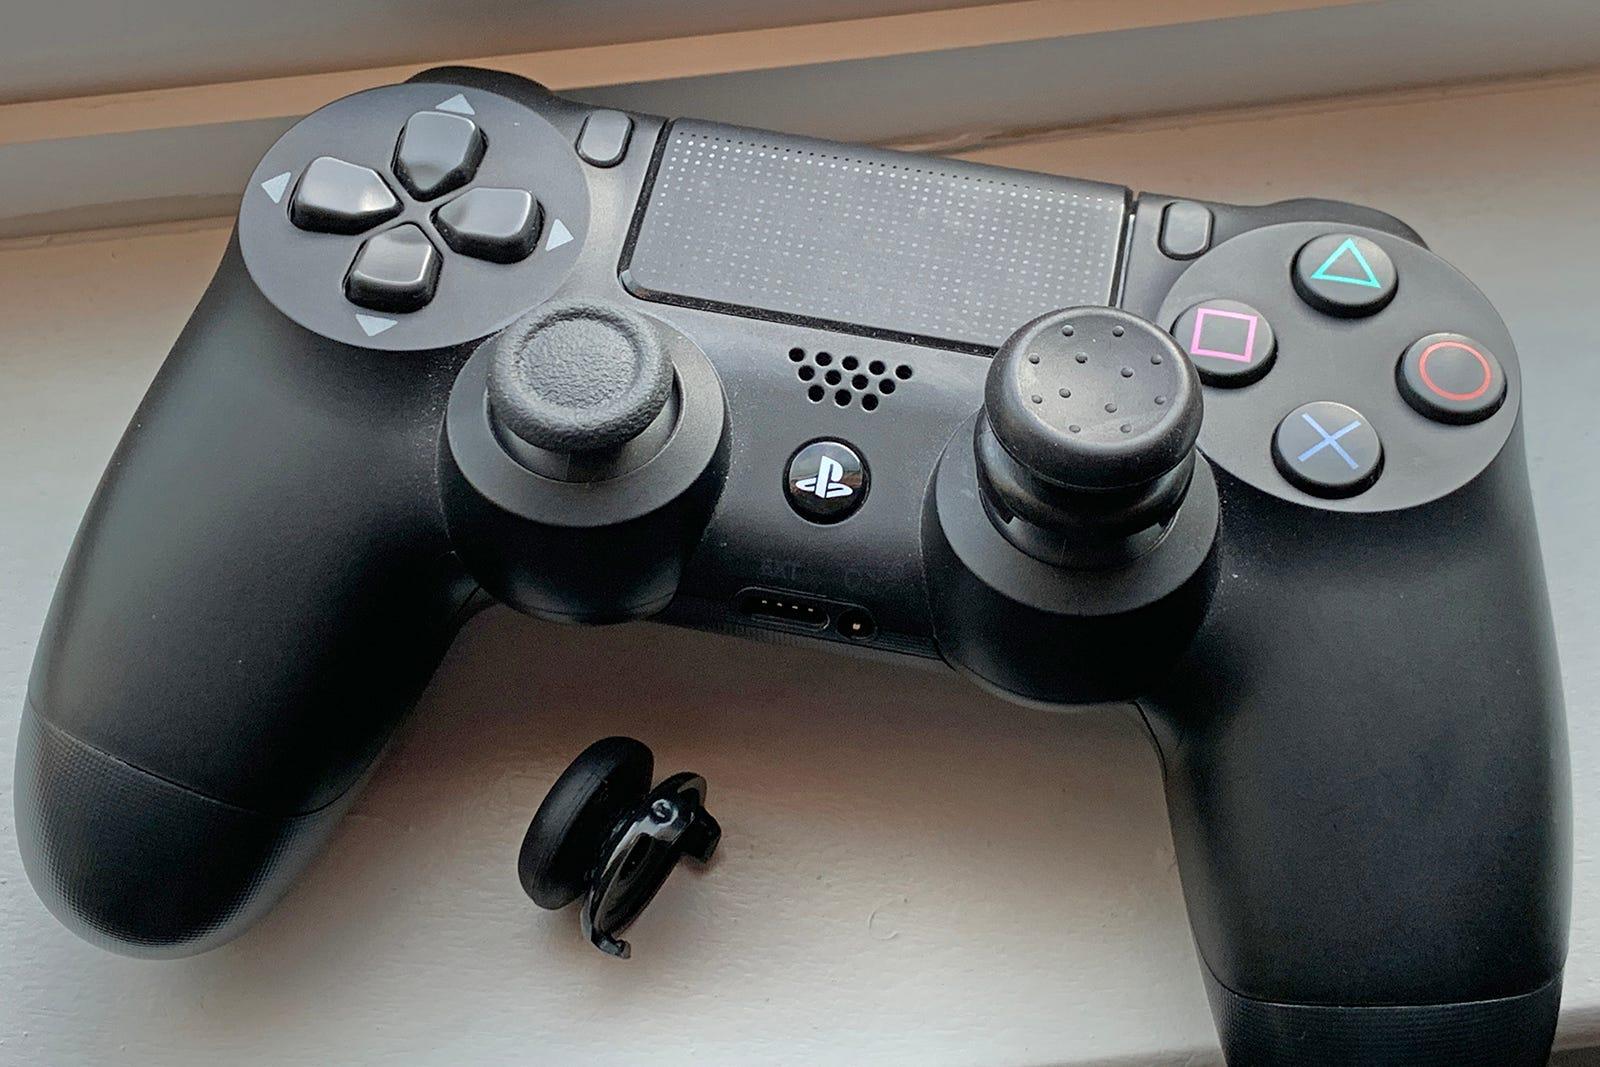 KontrolFreek performance thumbsticks on the DualShock 4